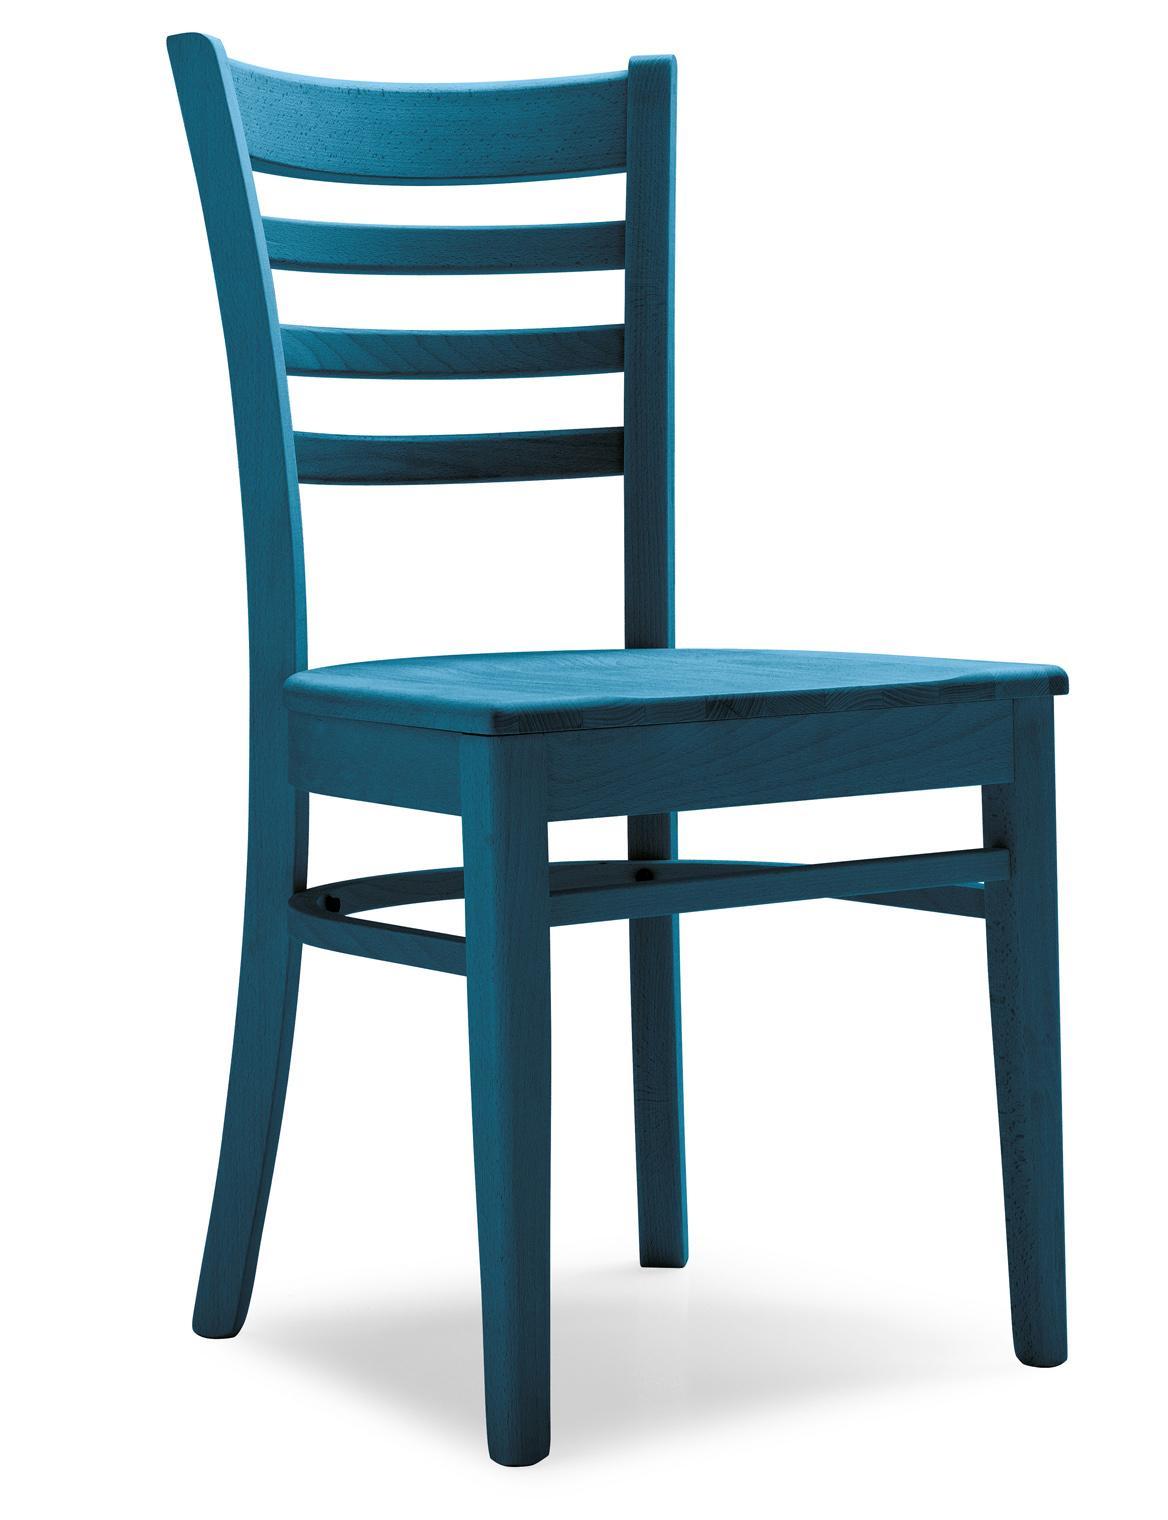 Sedie da ristoranti design 4 0 100000 0 pezzi for Sedie da design